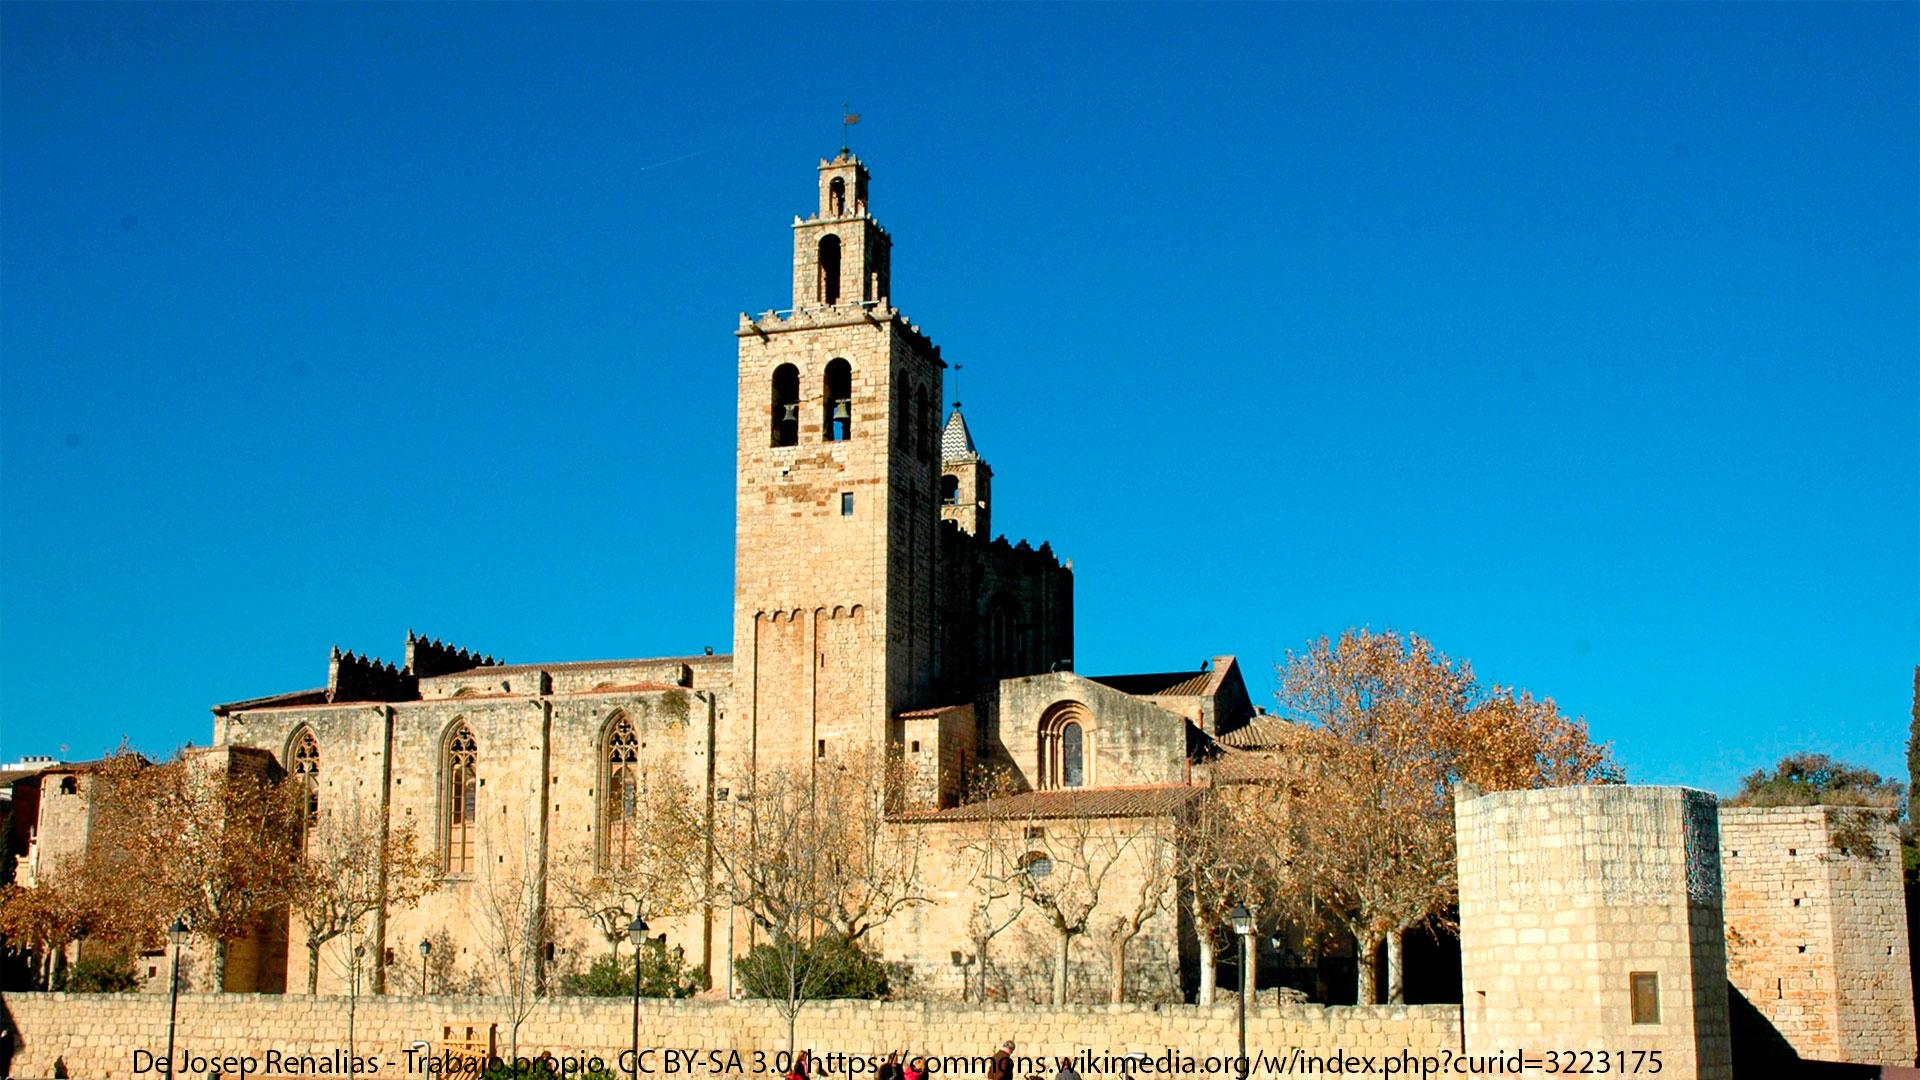 Mudanzas en Sant Cugat del Vallès